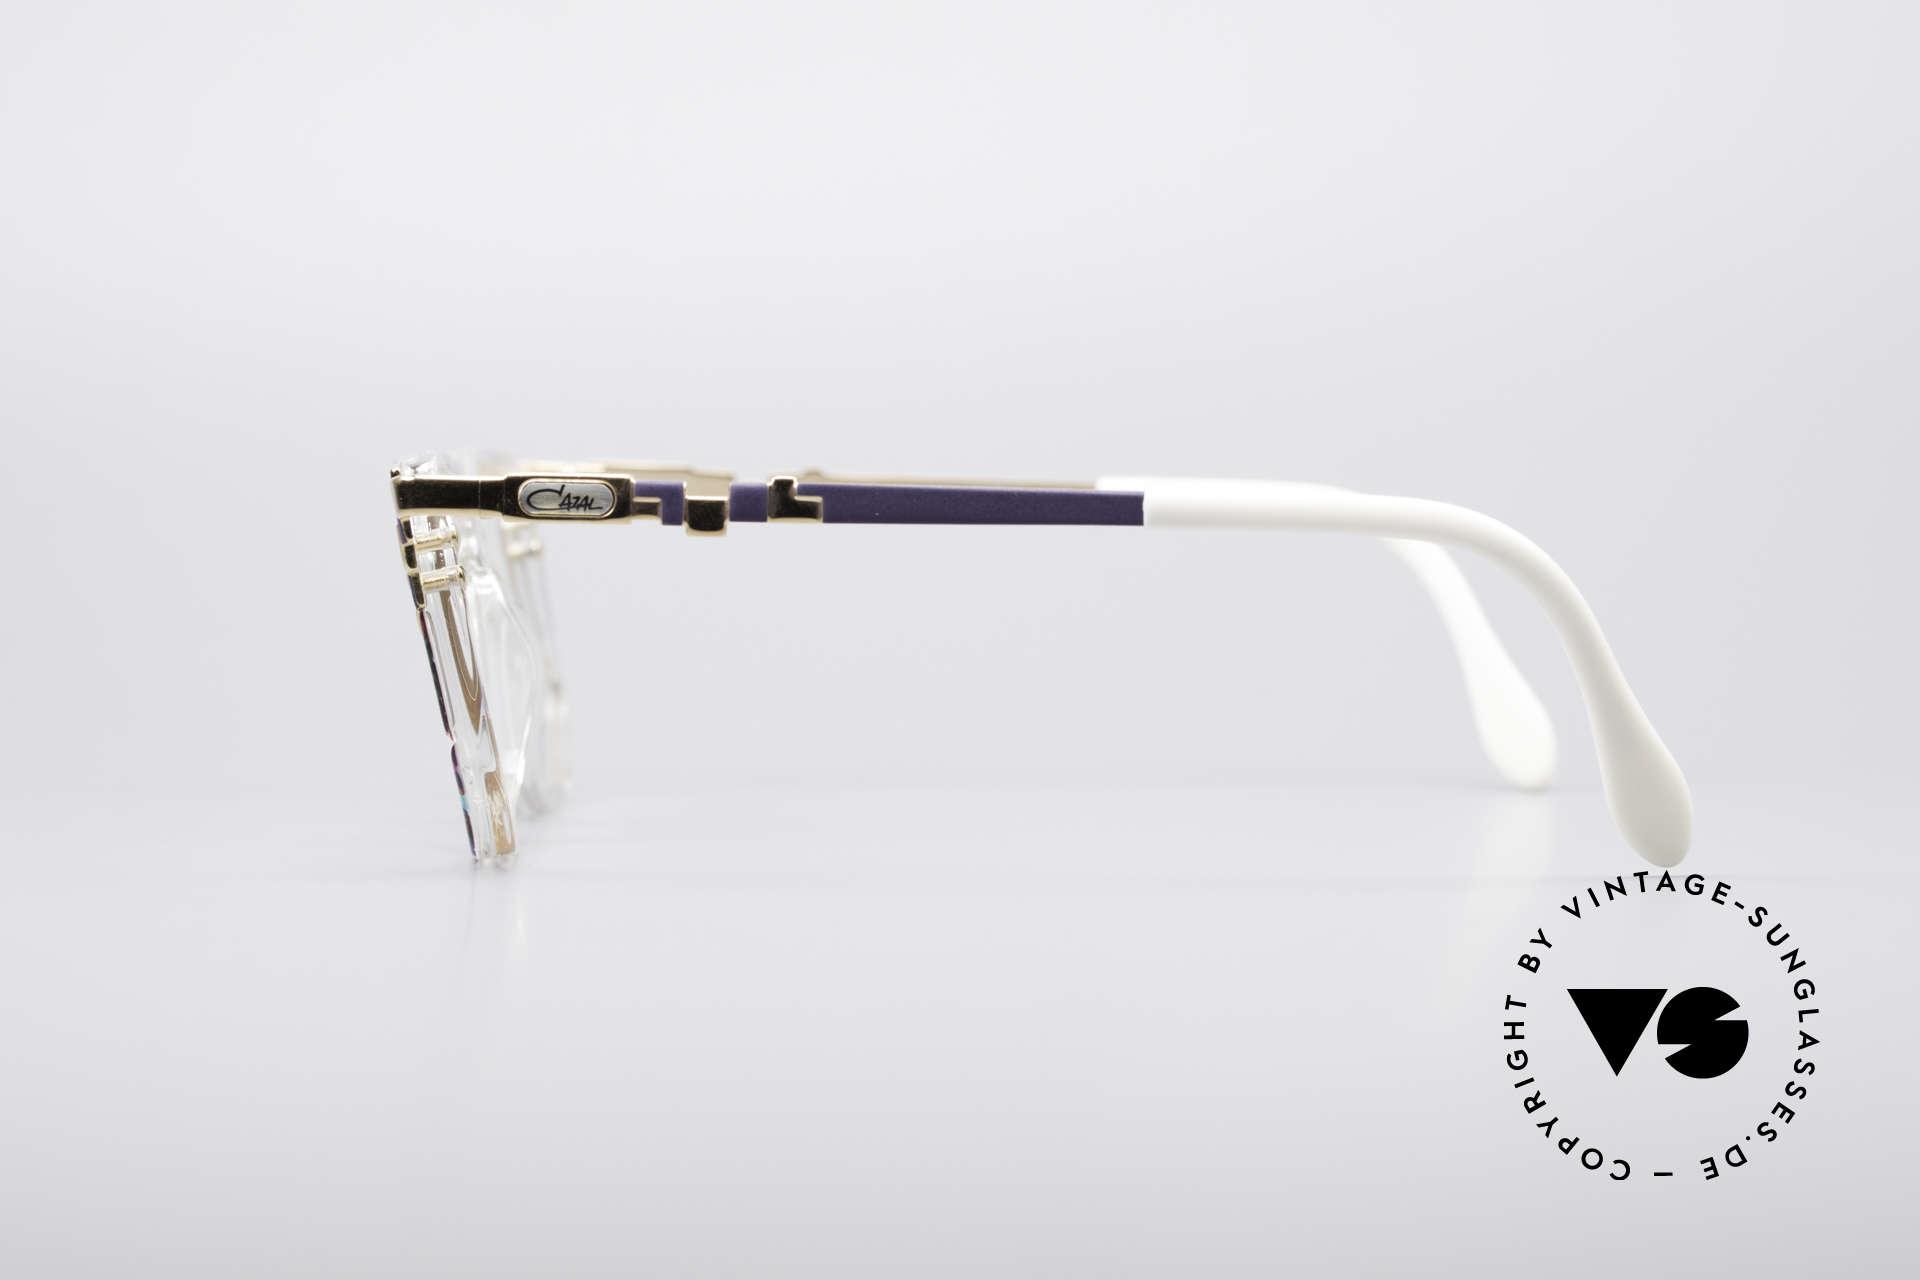 Cazal 357 Large Designer Eyeglasses, NO RETRO frame, but a 25 years old ORIGINAL!!, Made for Women